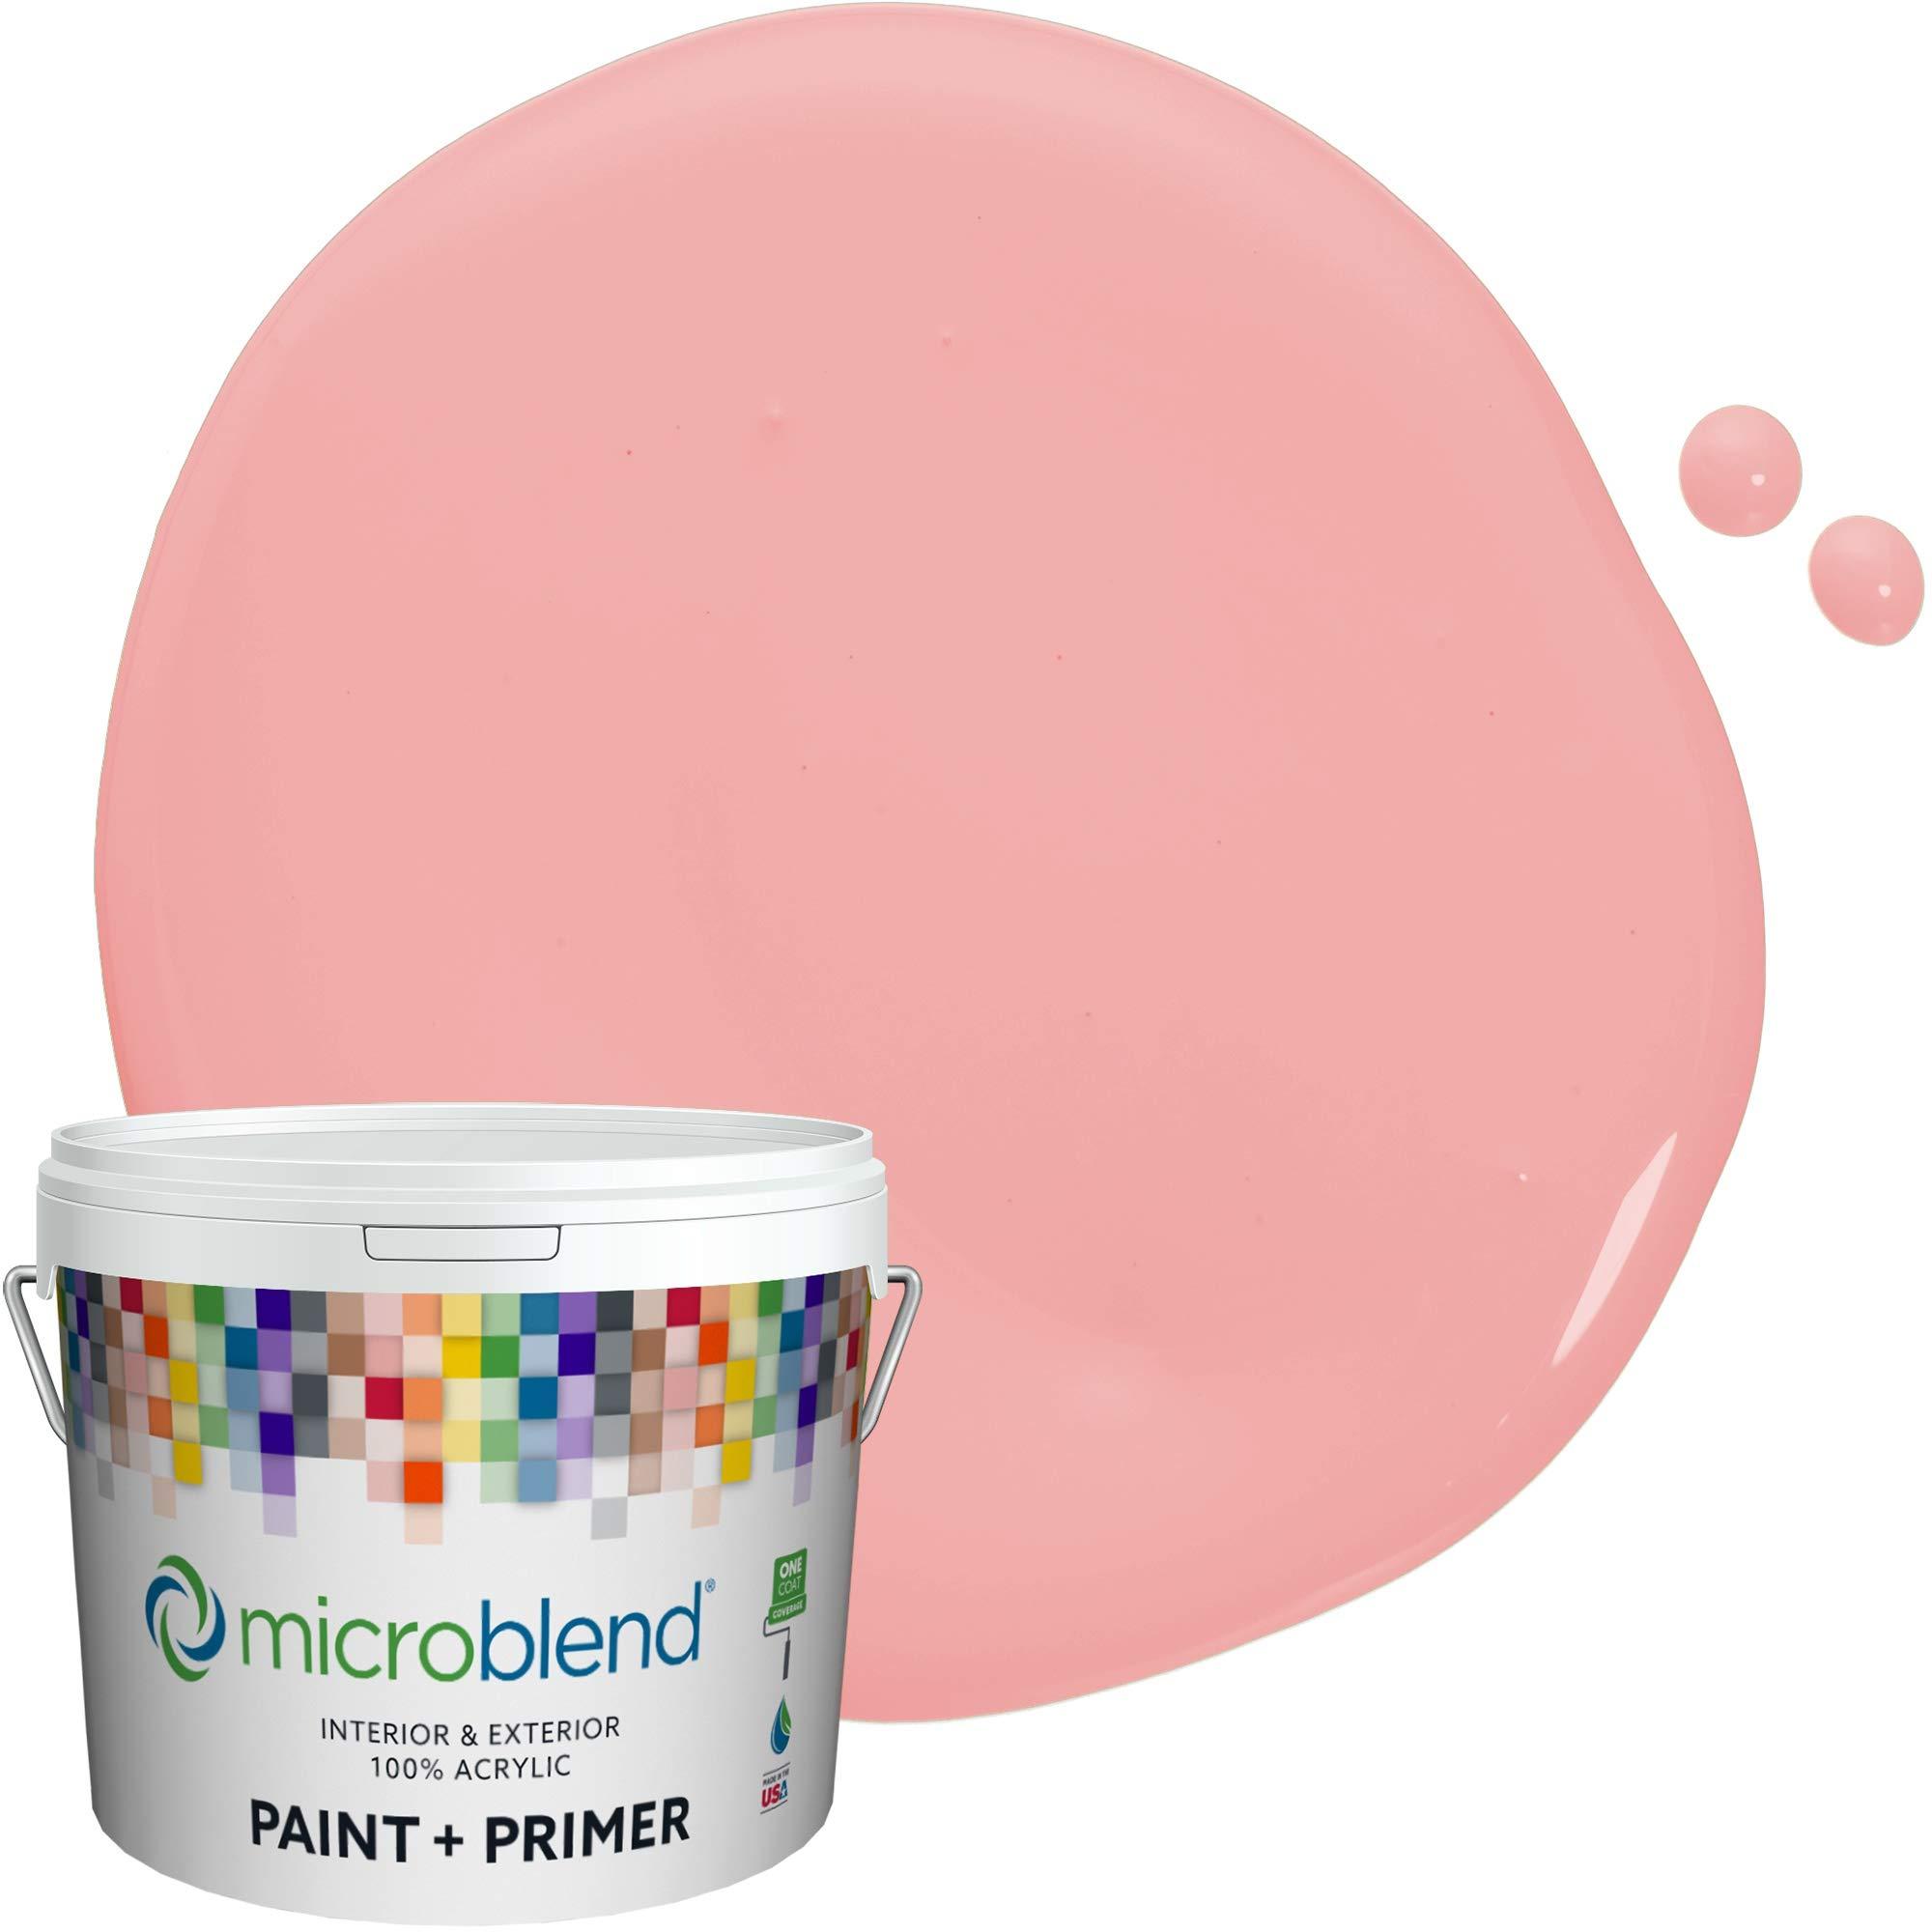 Microblend Interior Paint + Primer, Abbey Rose, Eggshell Sheen, 5 Gallon, Custom Made, Premium Quality One Coat Hide & Washable Paint (73221-5-M1100B4)